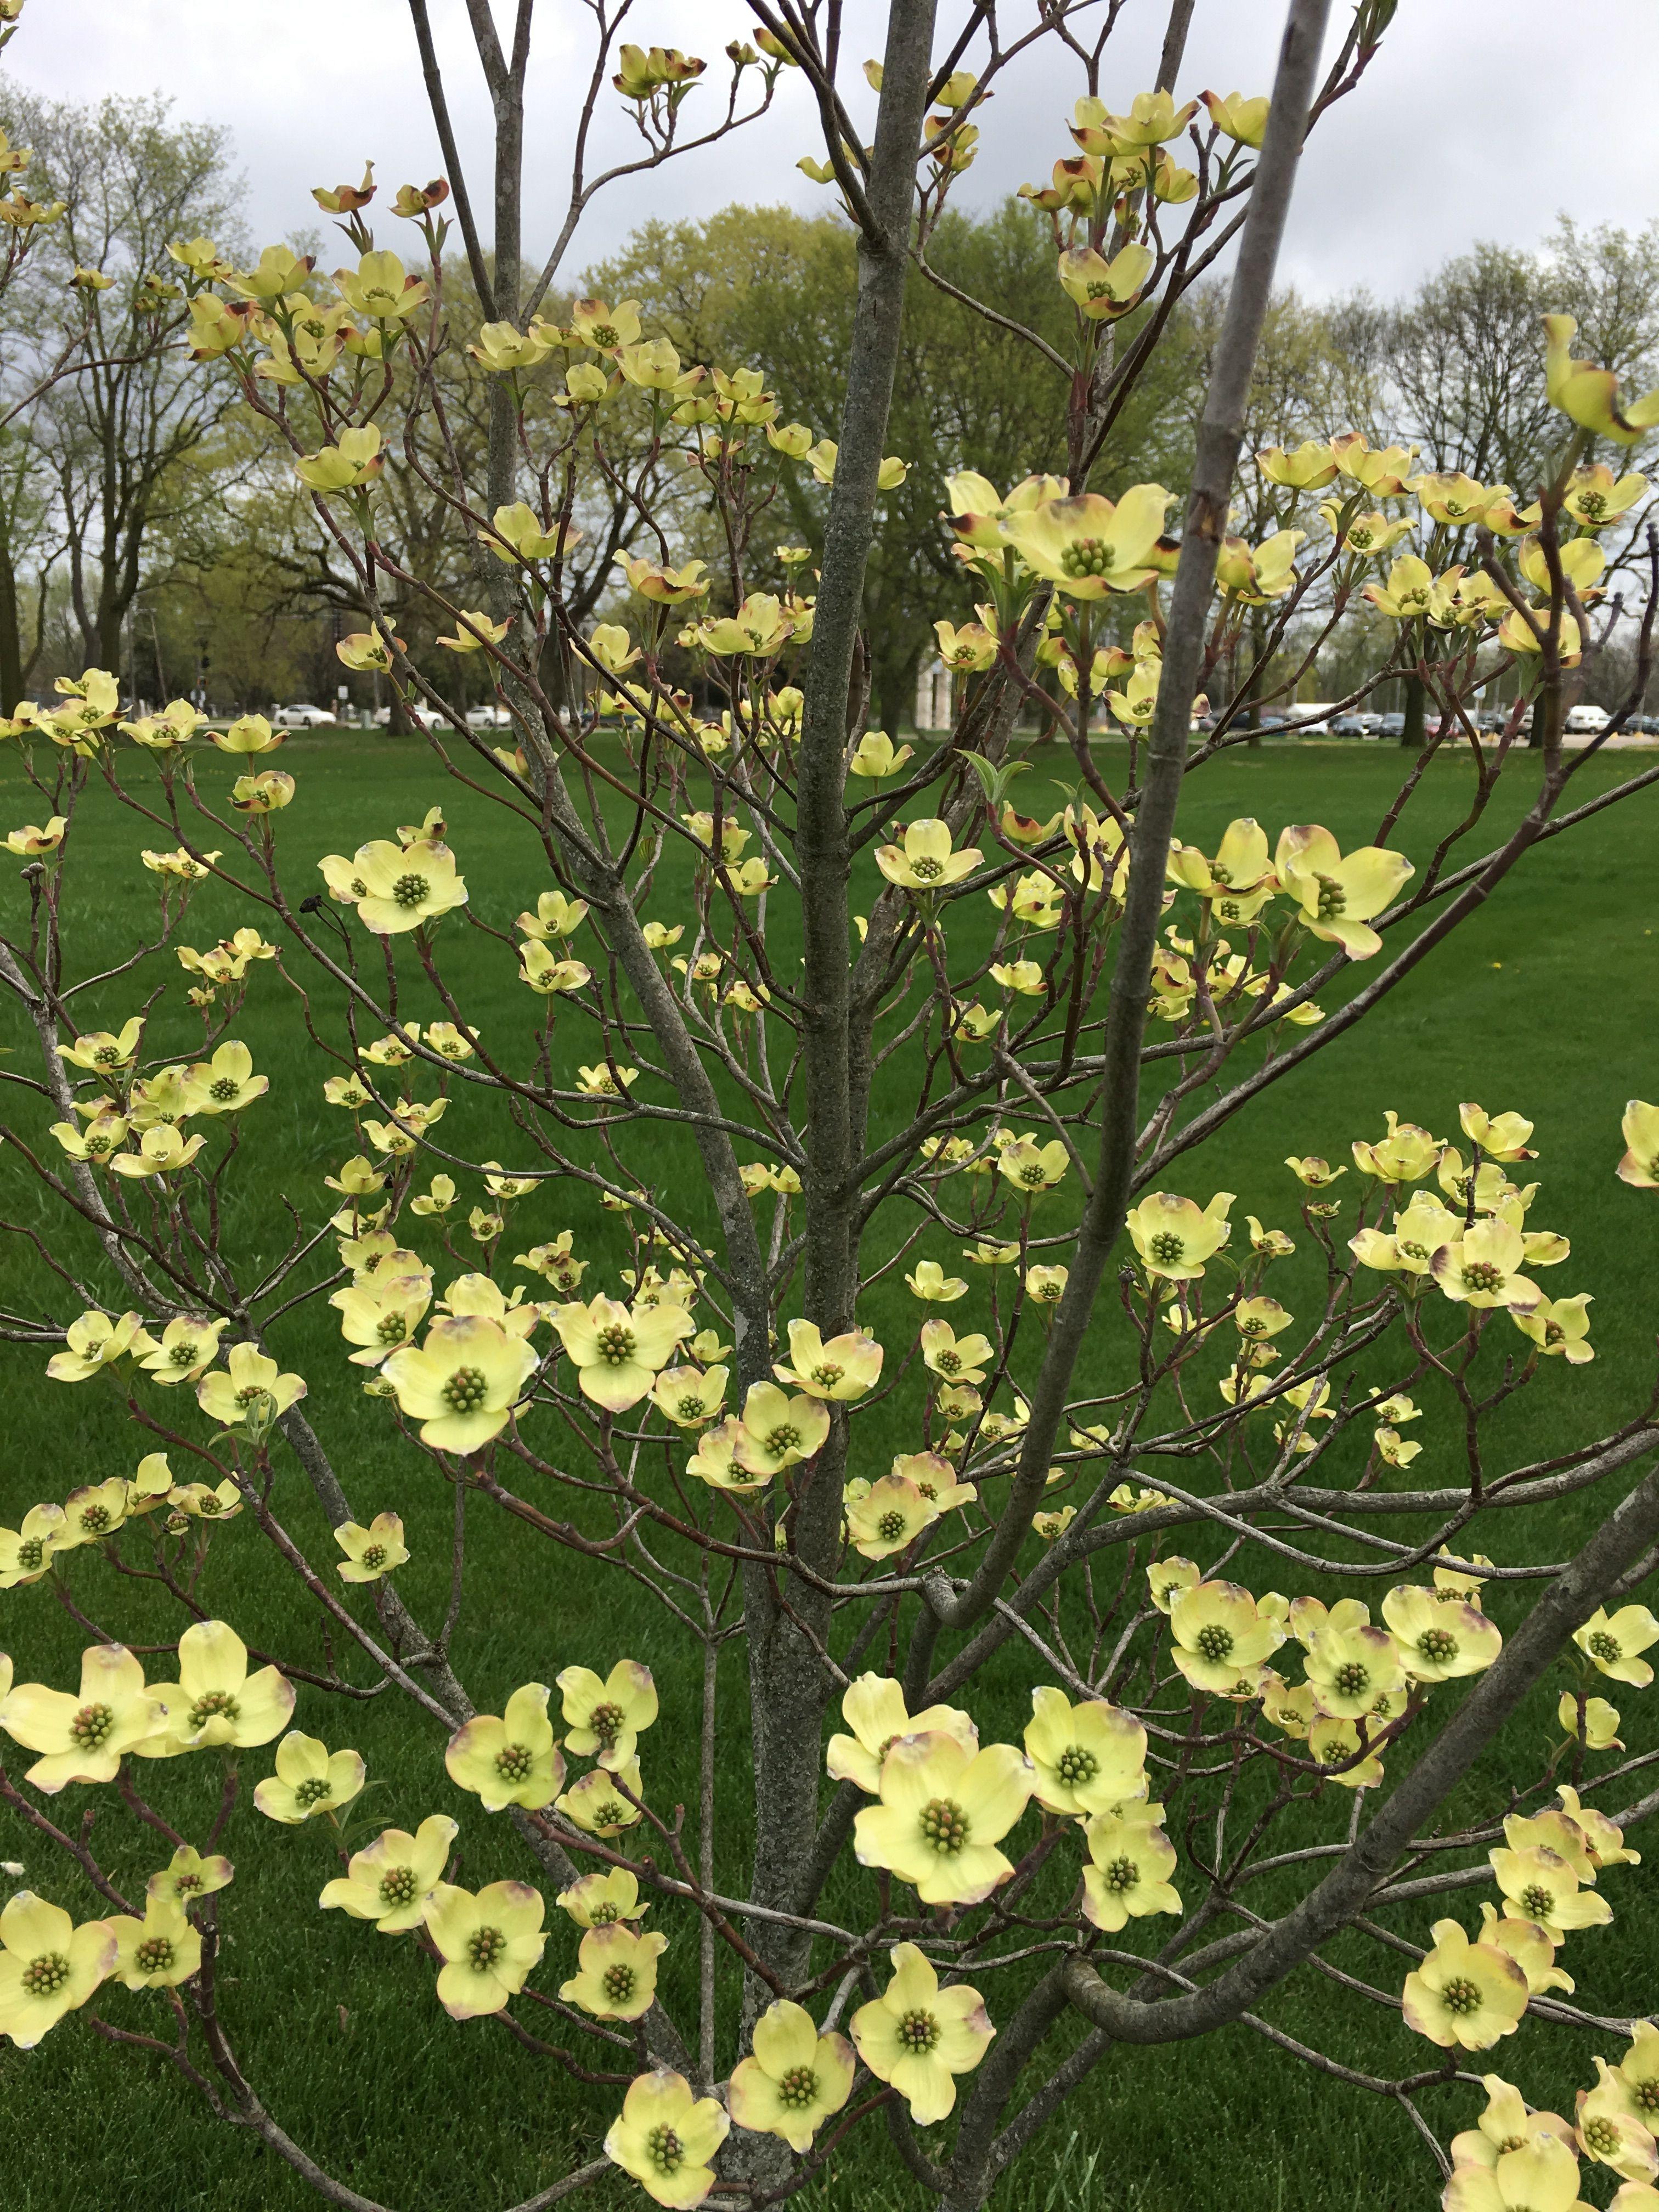 White Flowering Dogwood. Pale yellow flowers turn to white